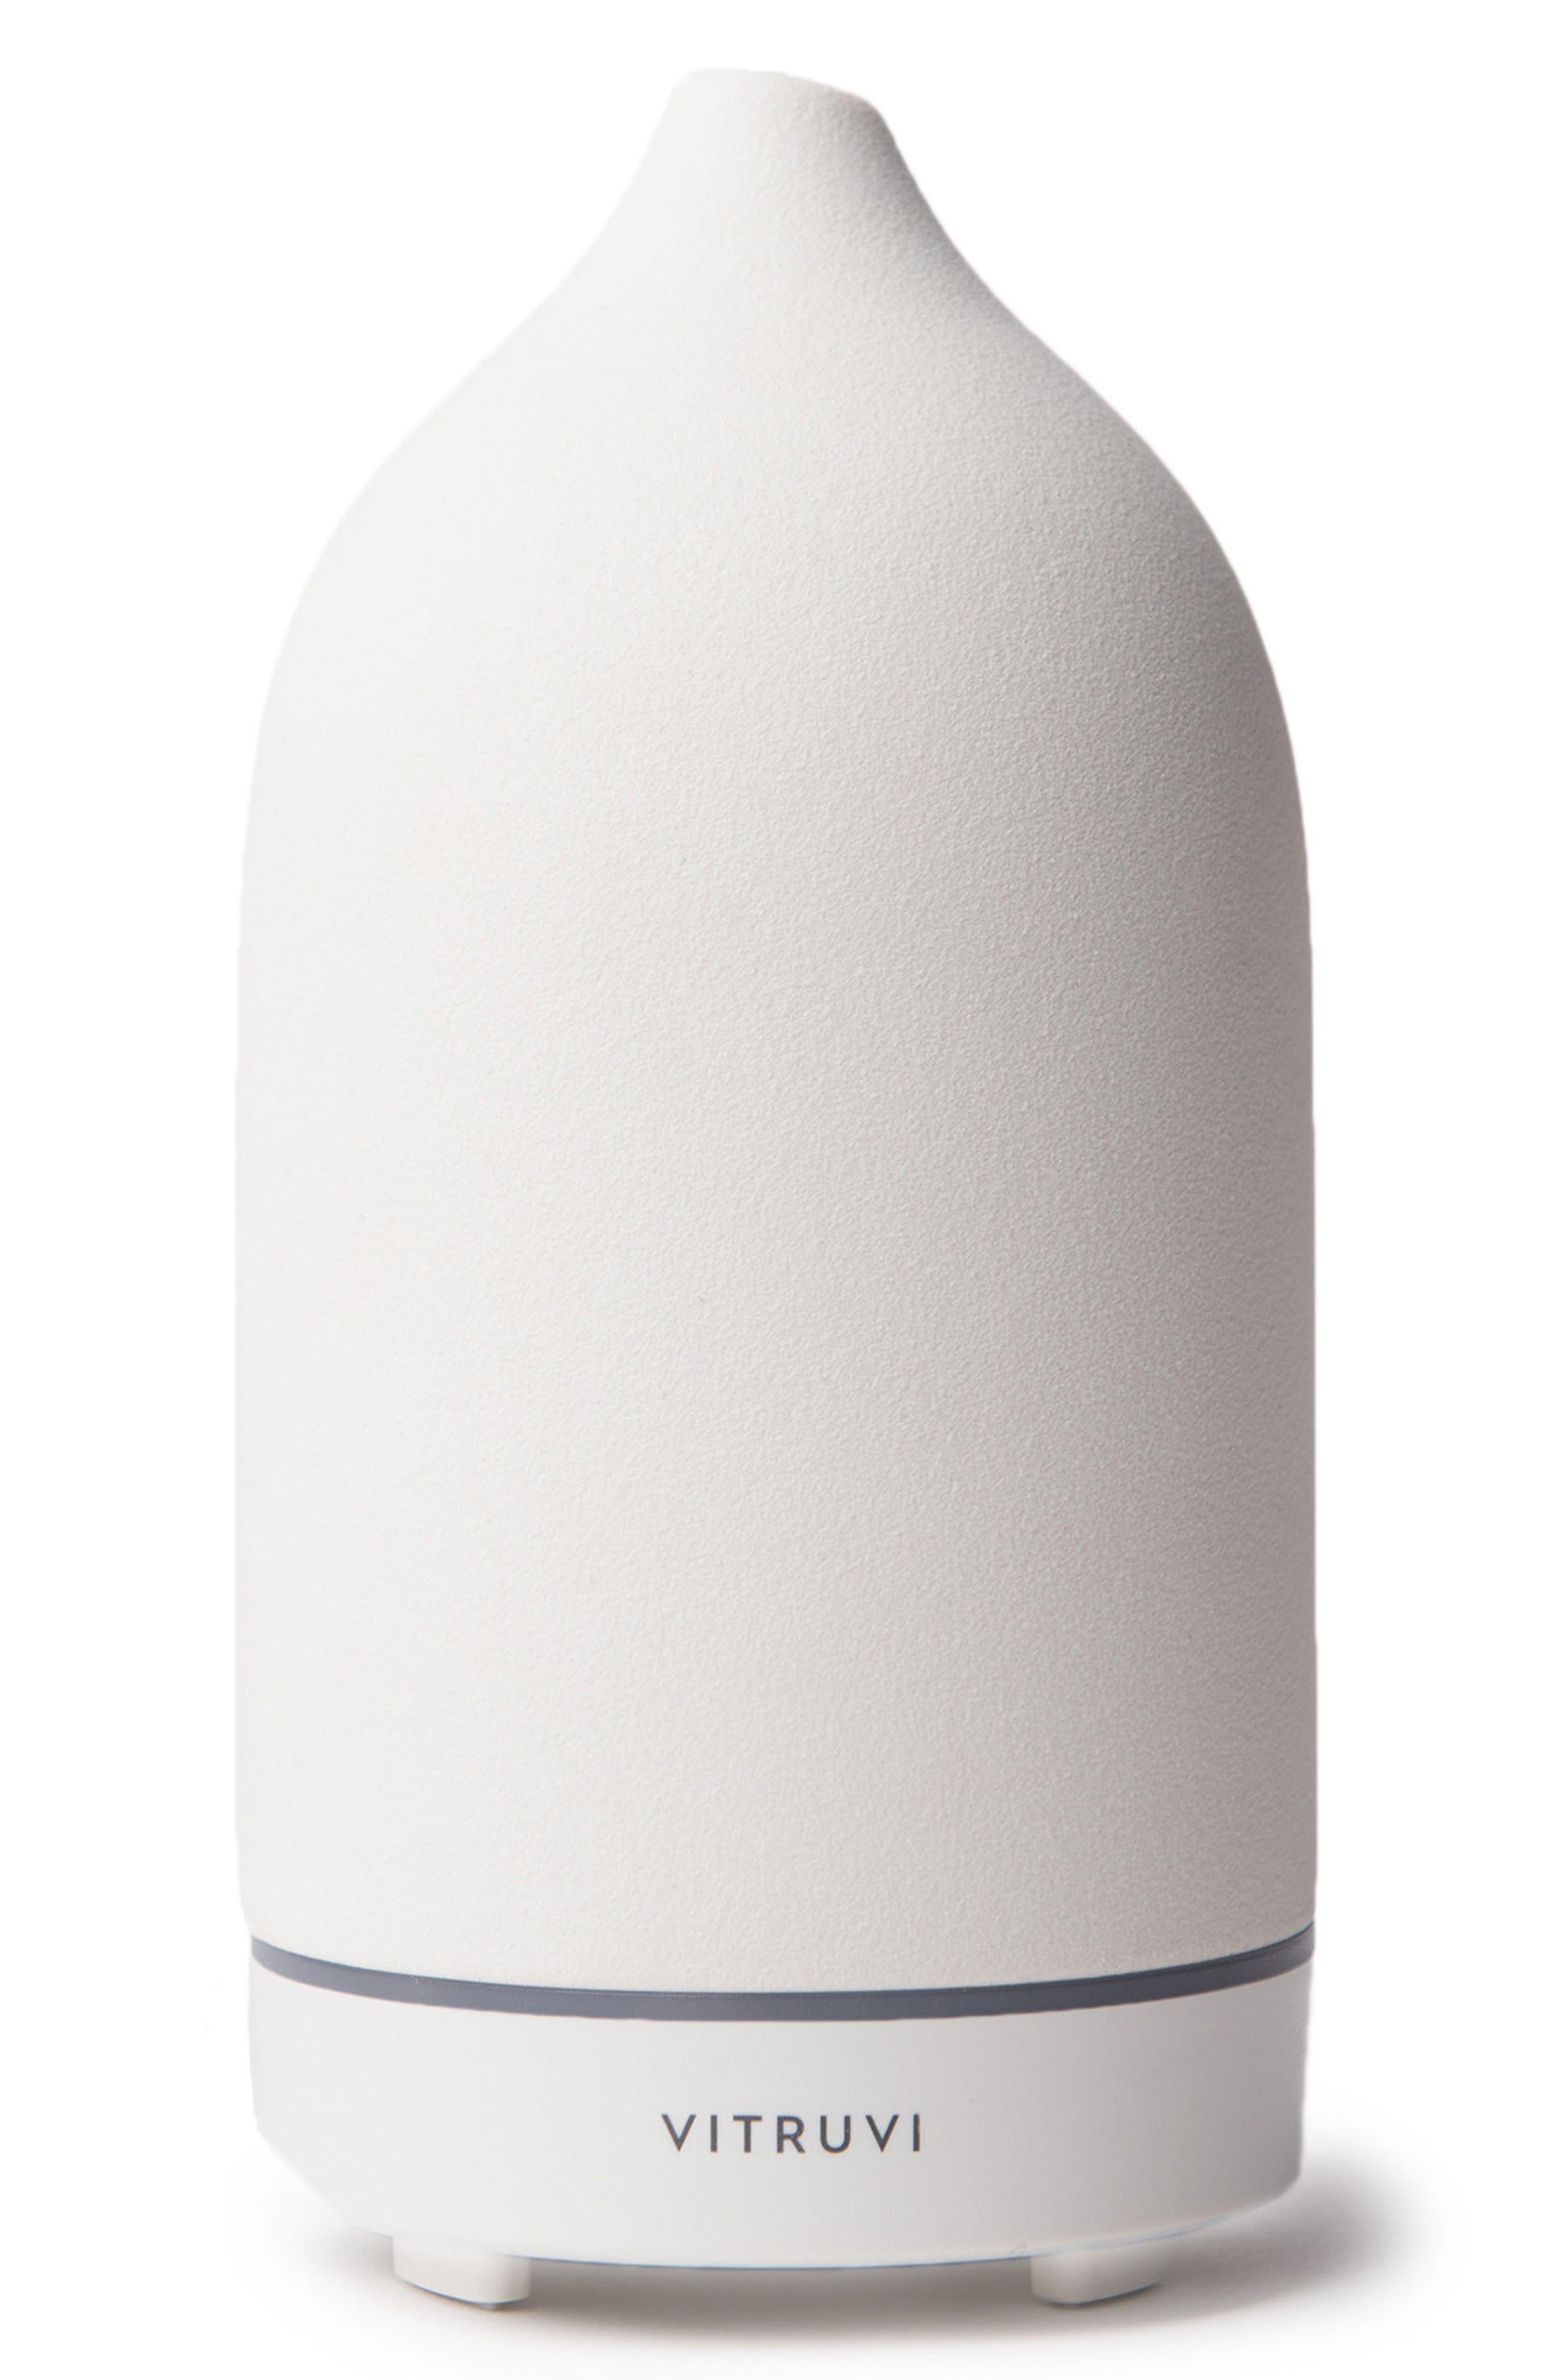 Vitruvi Porcelain Essential Oil Diffuser